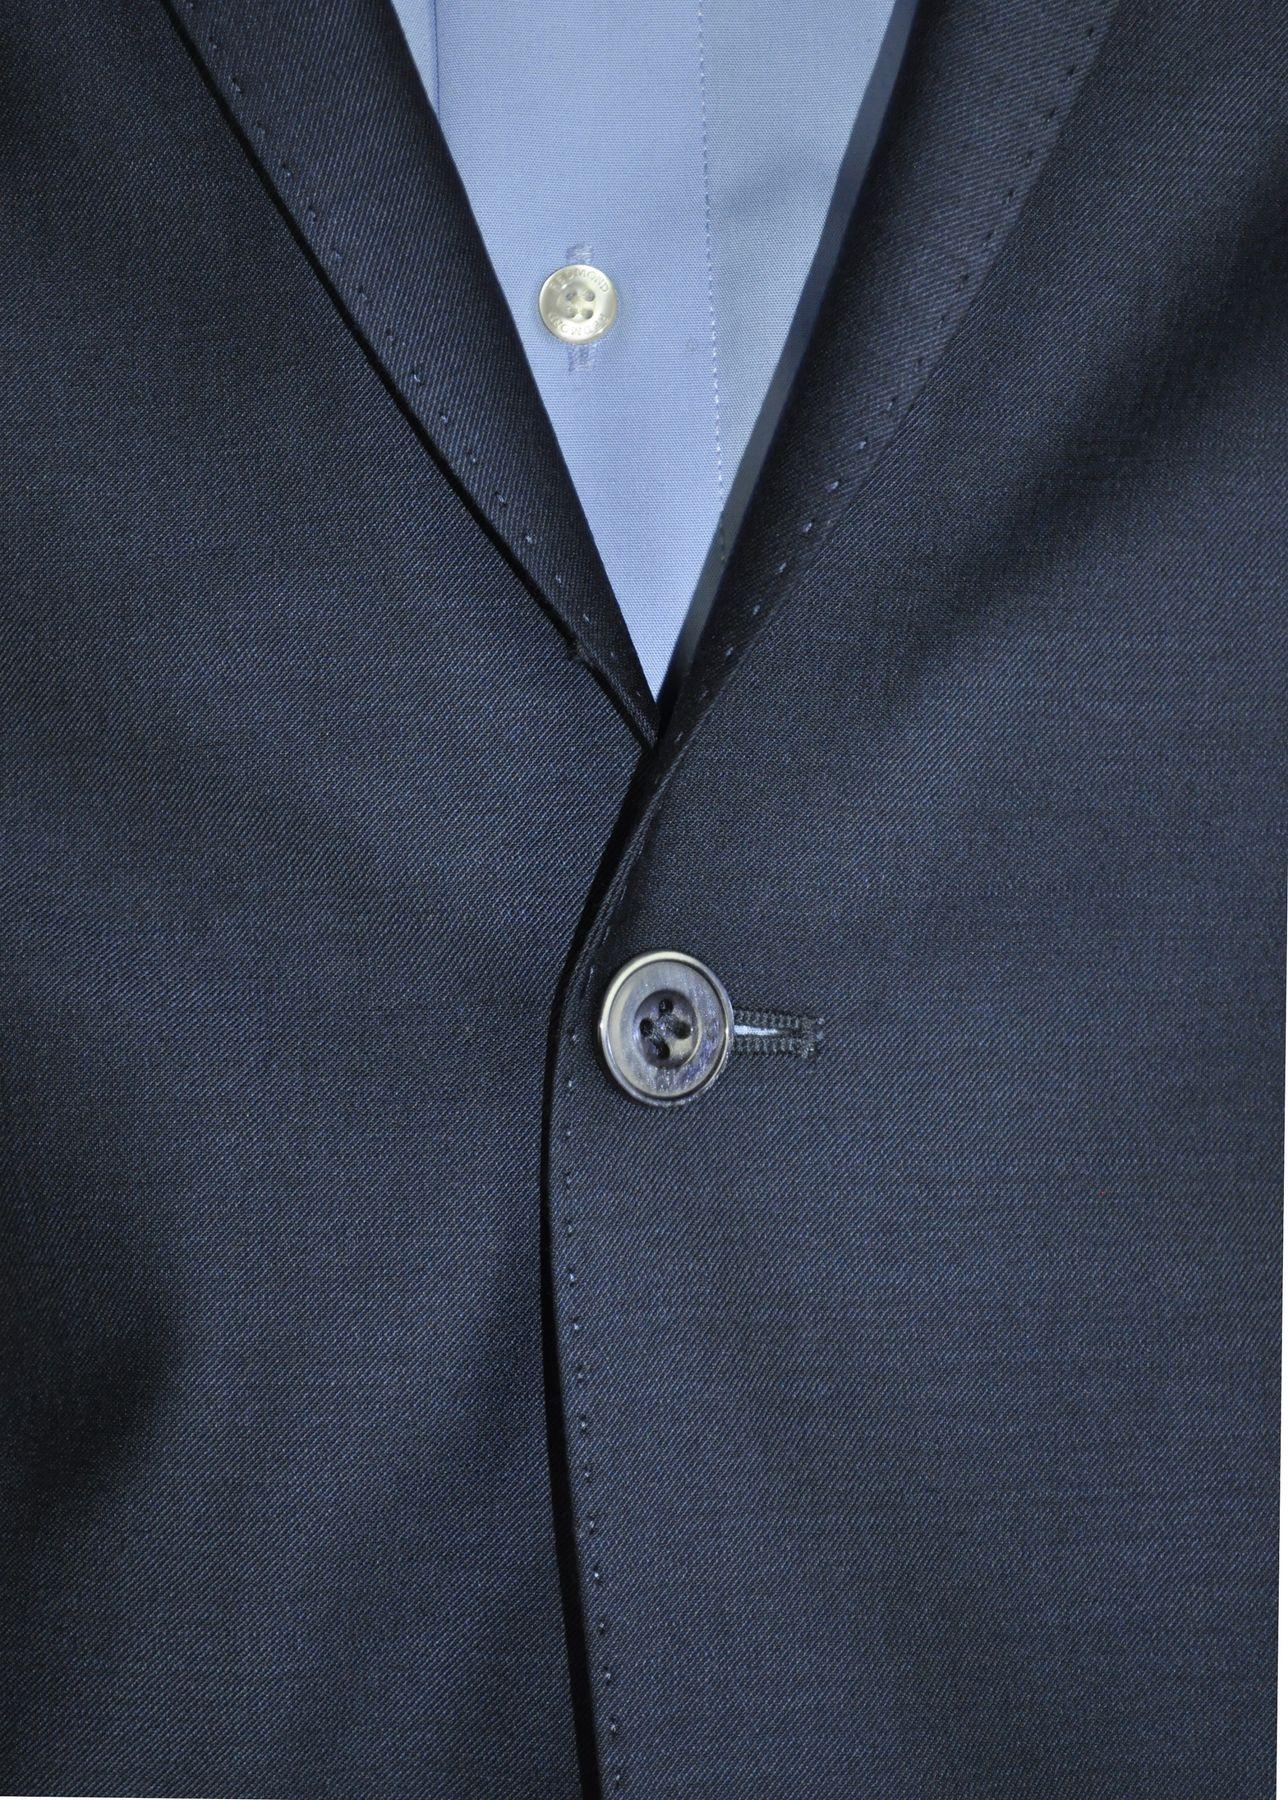 Abiball Anzug - Slim Fit - Herren Anzug in Deep Ocean Blue, Luigi B/Elio (Art.: 835 1510) – Bild 3